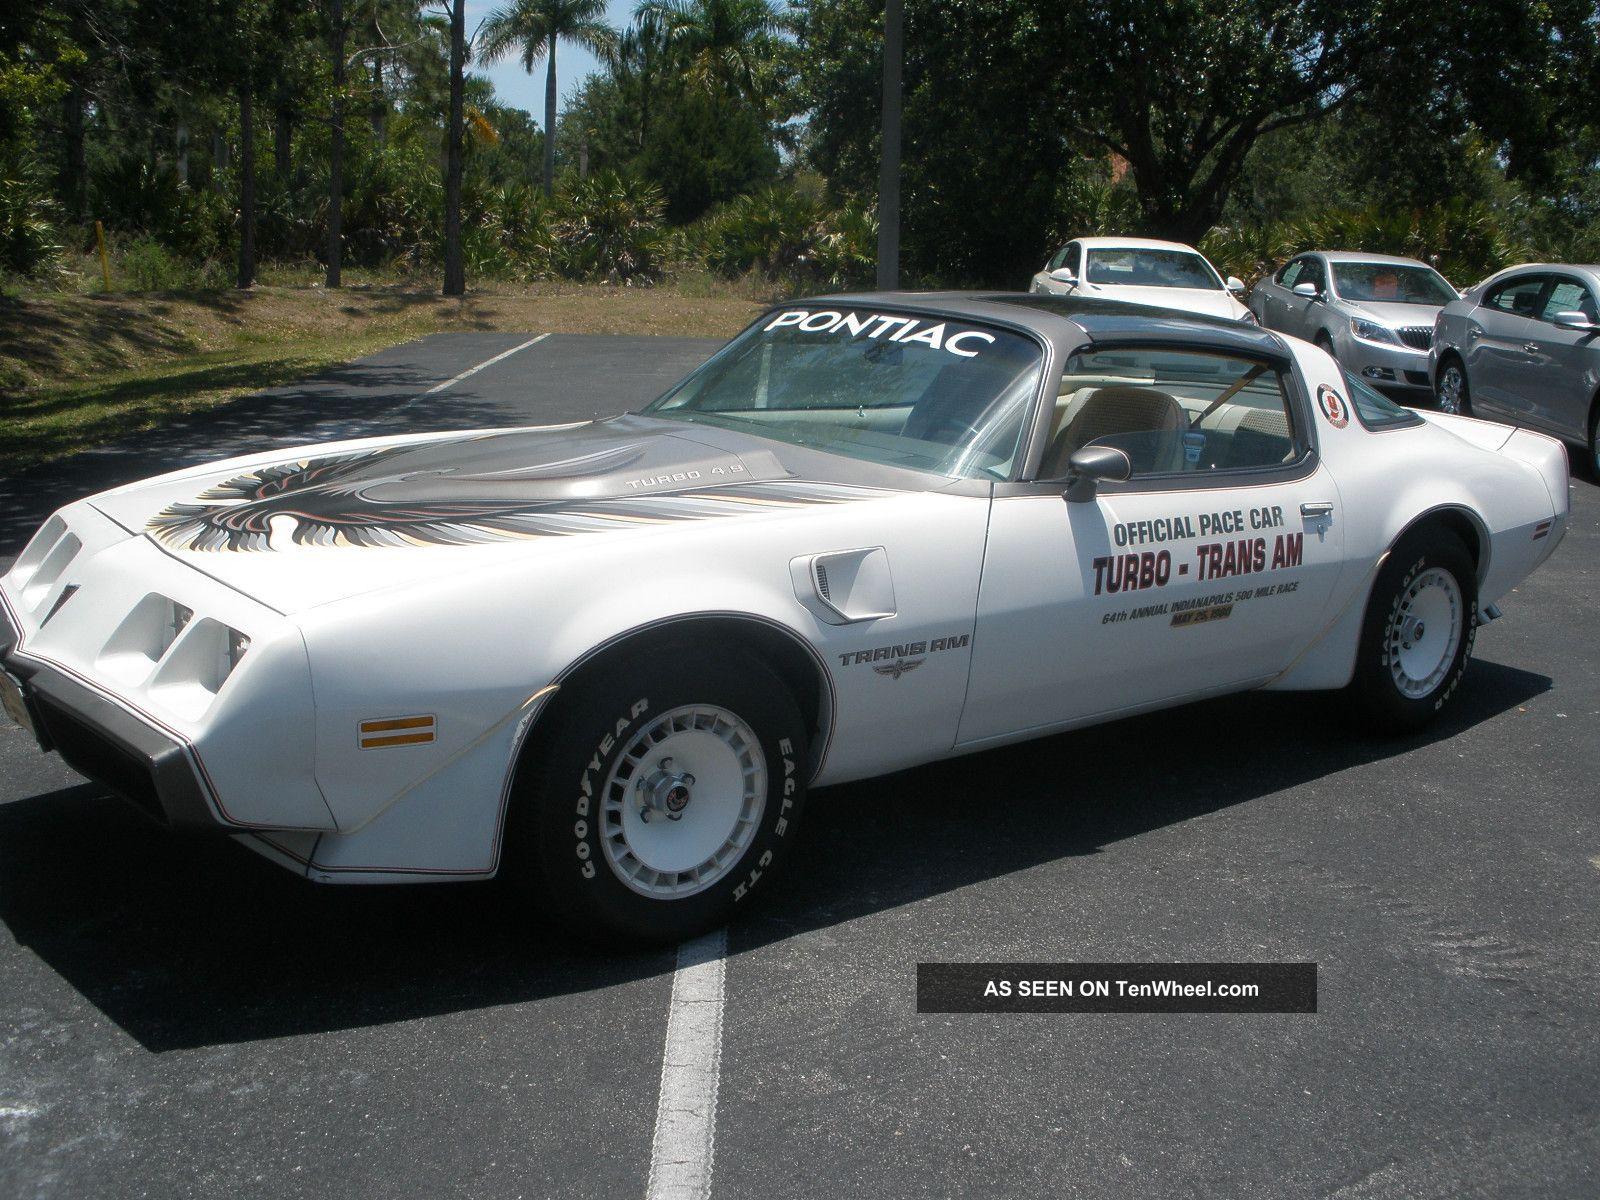 1980 Pontiac Transam Indy Pace Car 4 9l Turbo Coupe